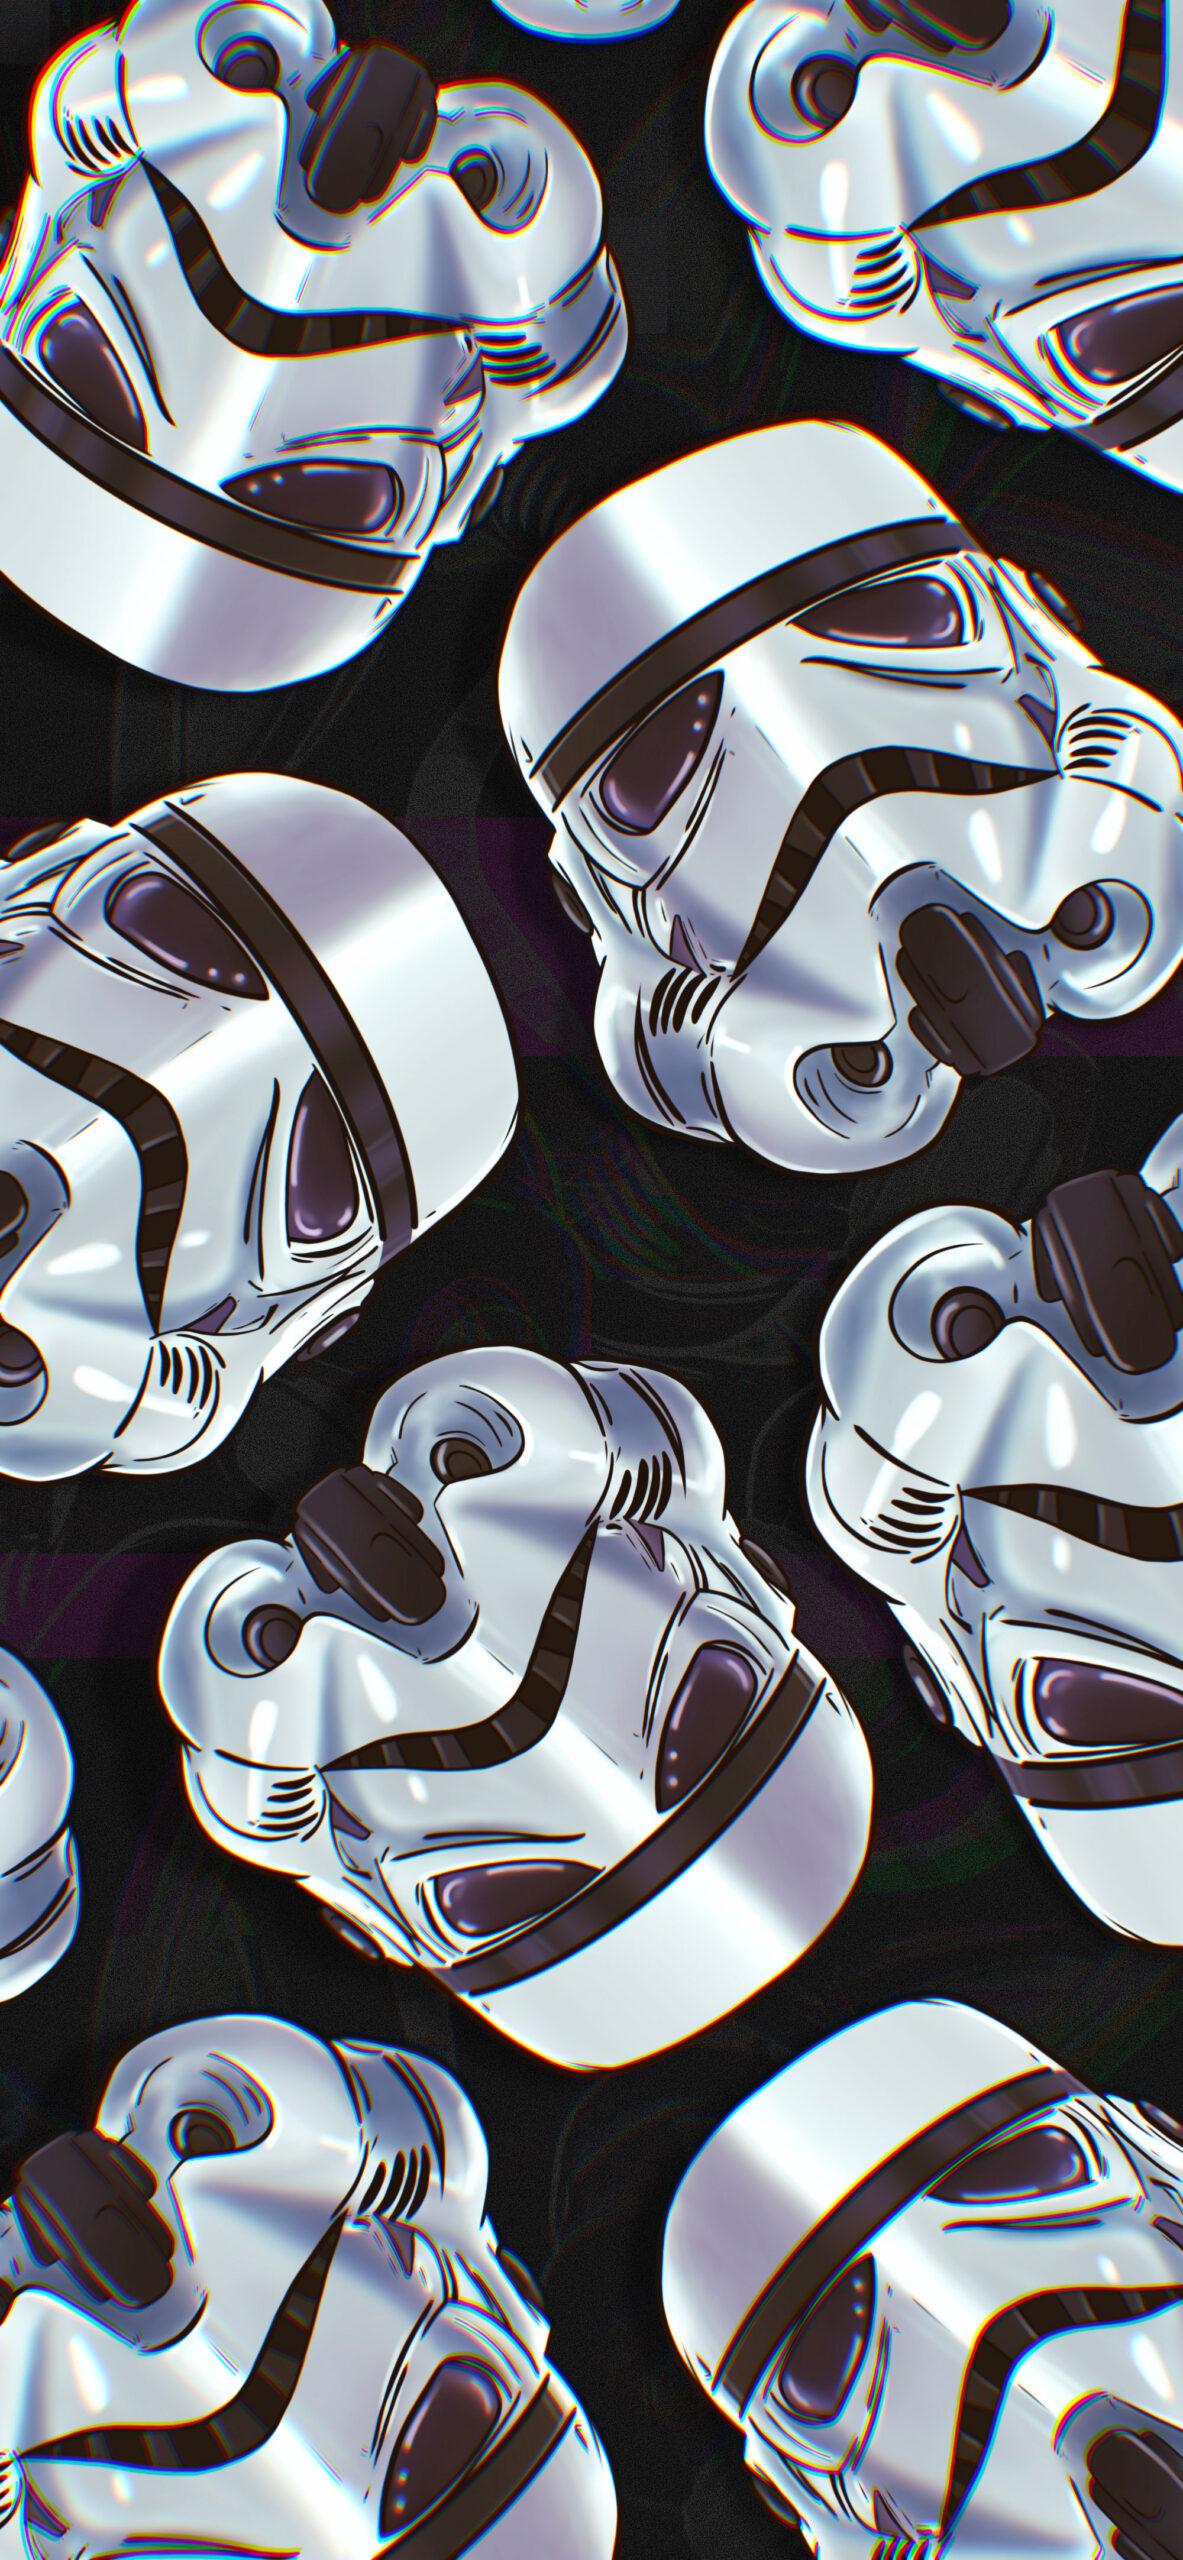 star wars stormtrooper helmet glitch wallpaper 2